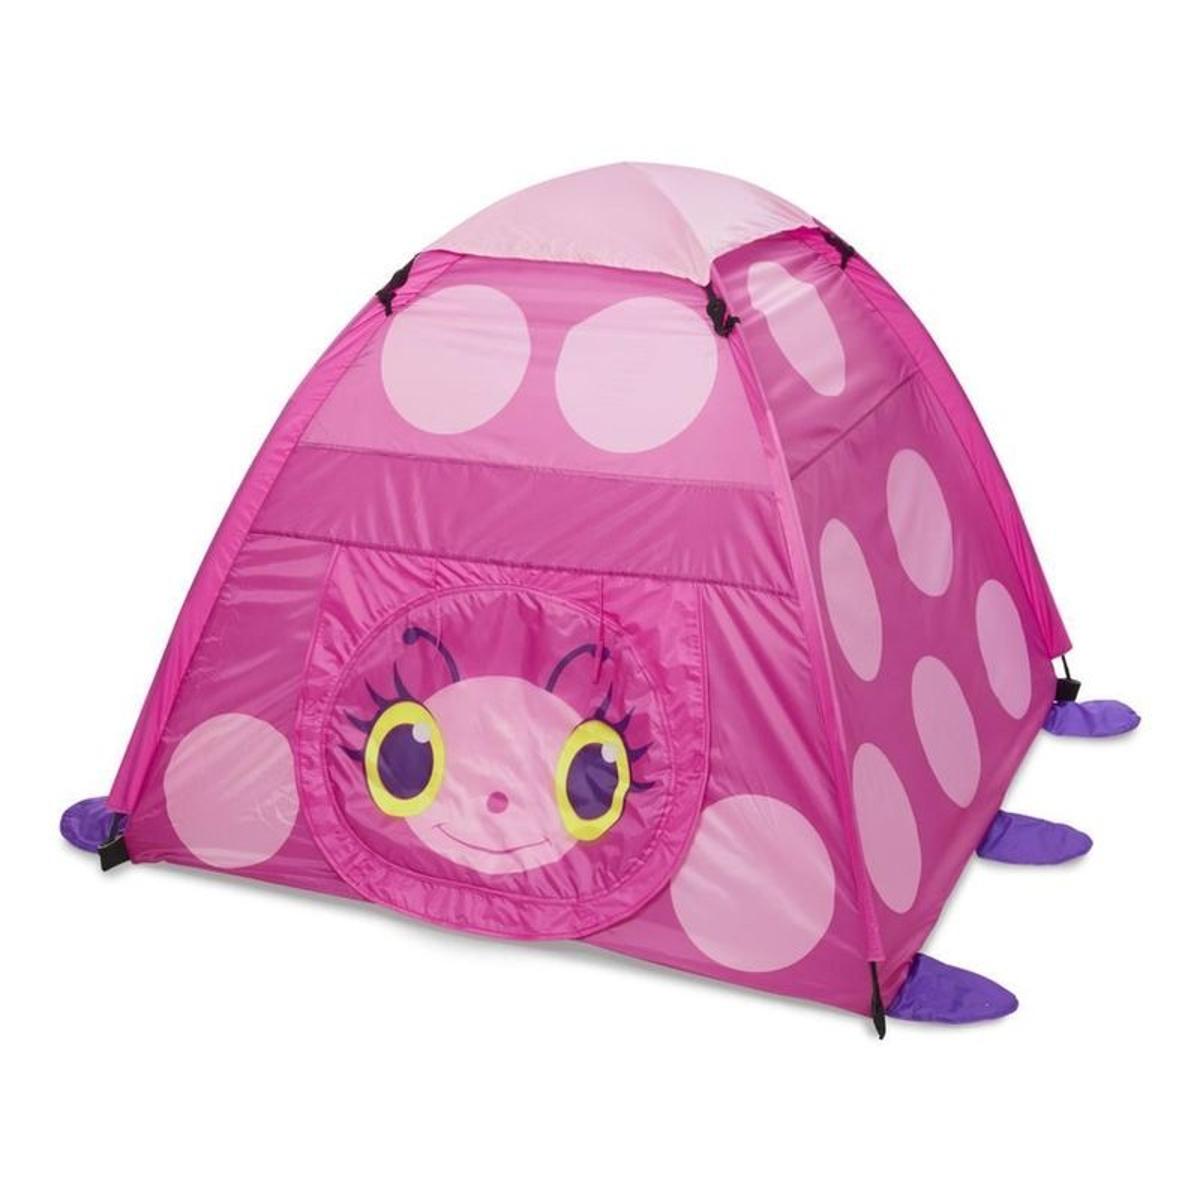 Tente de camping Sunny Patch